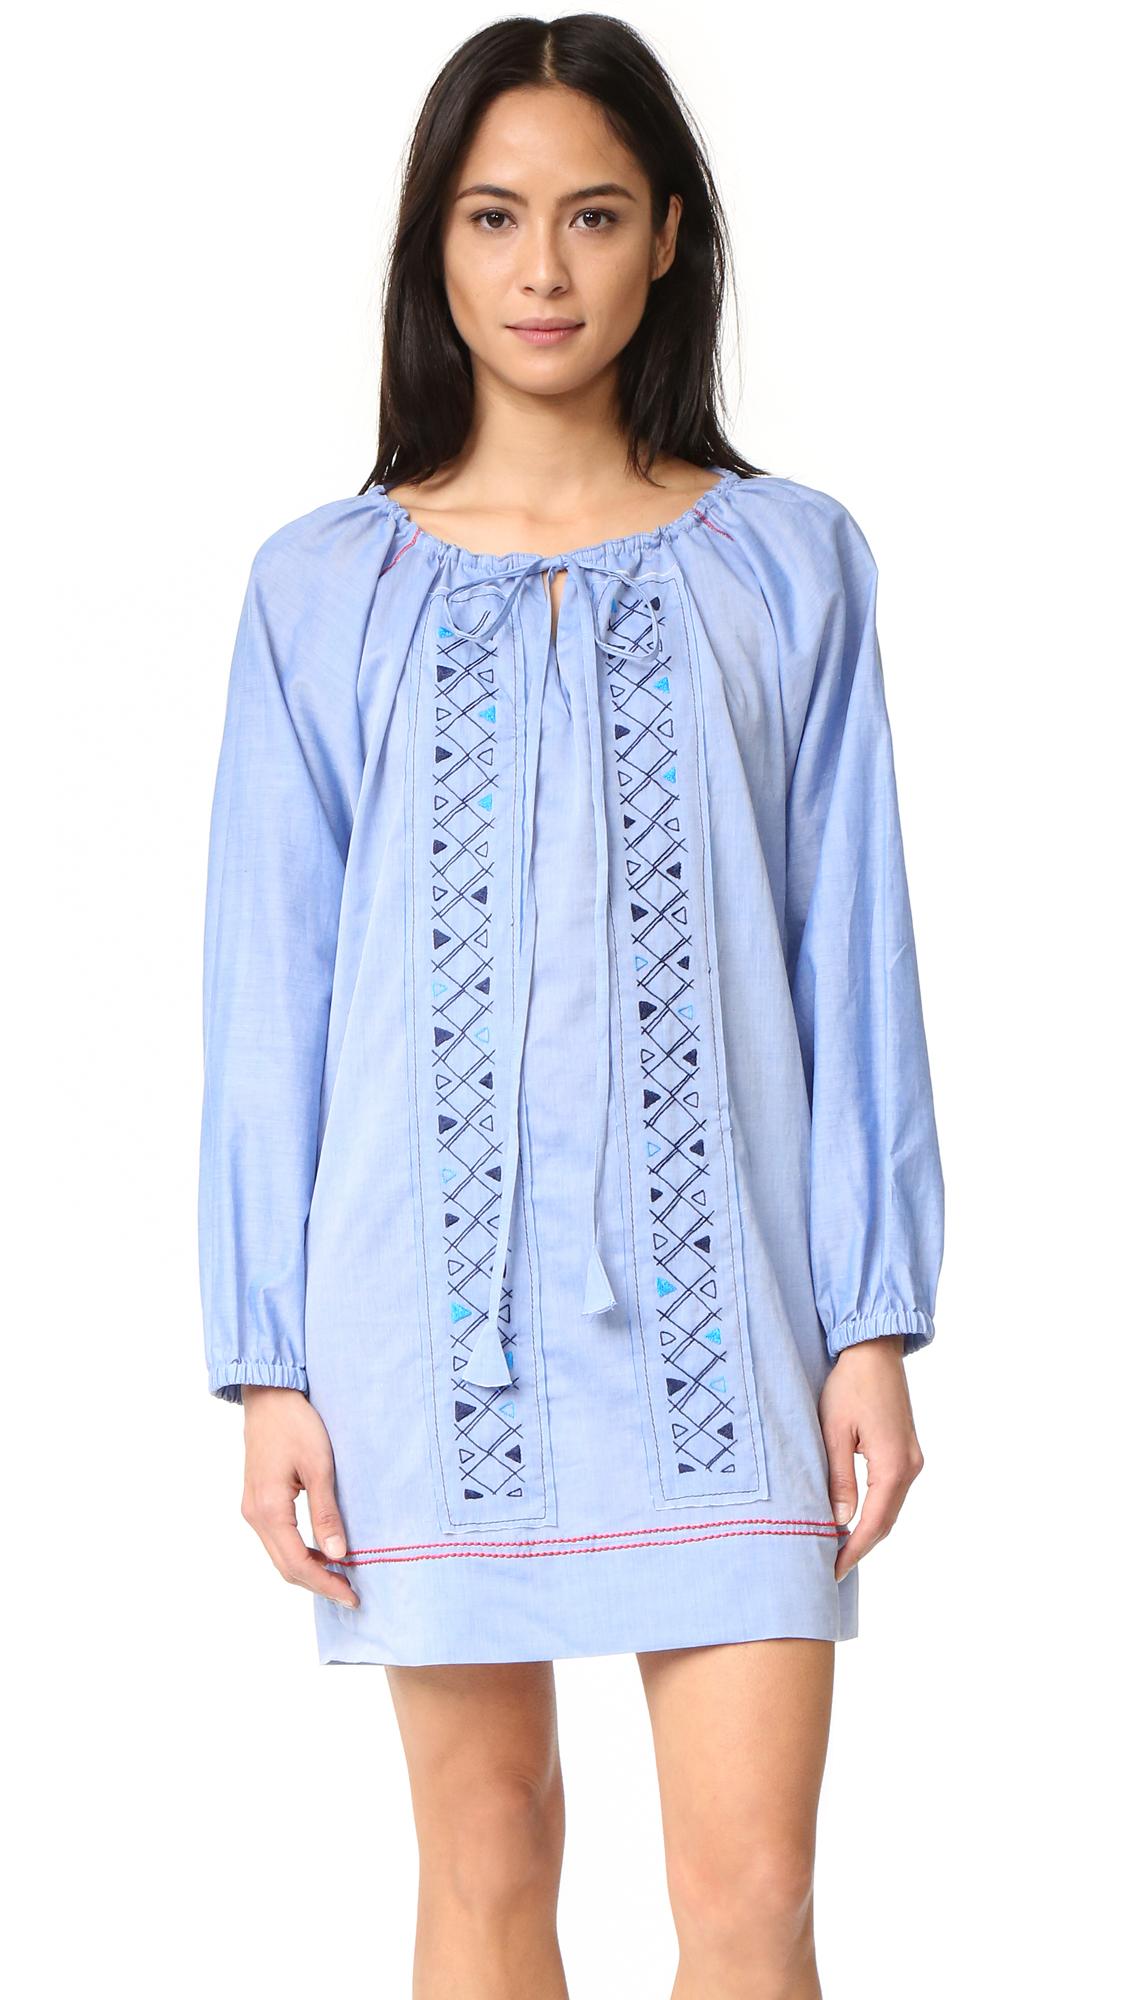 Lemlem Oni Dress - Chambray at Shopbop